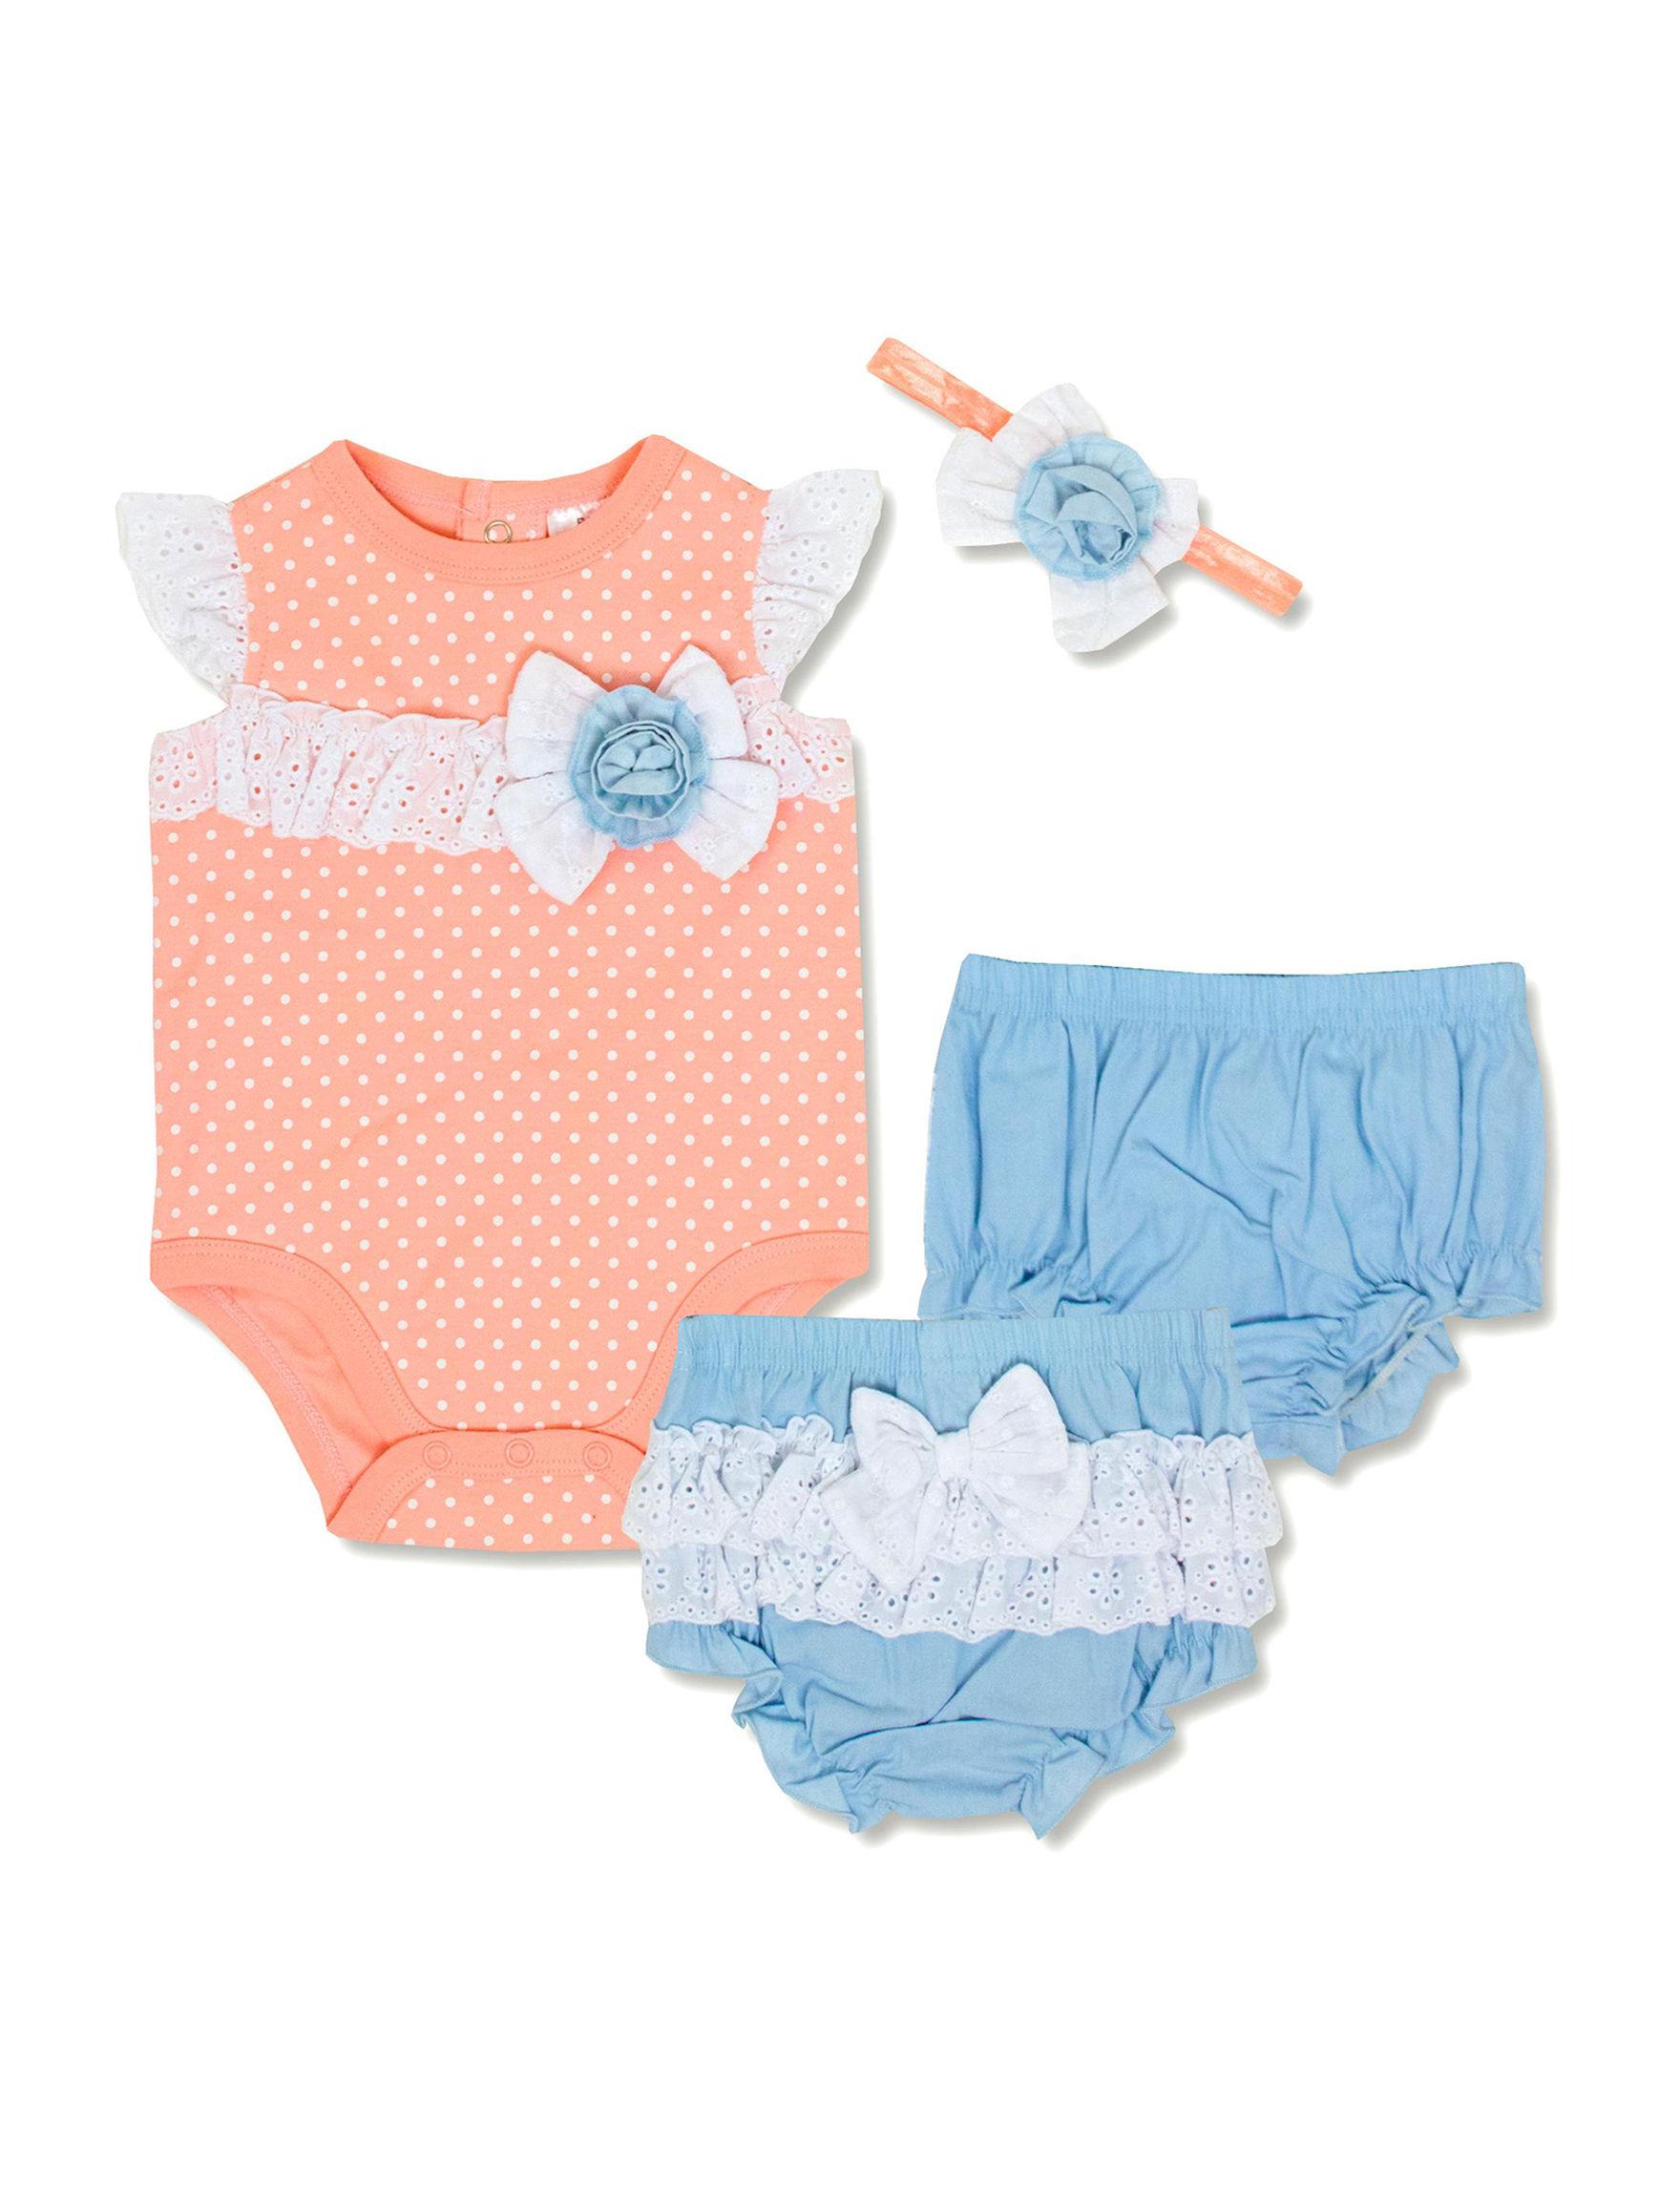 Baby Essentials Coral